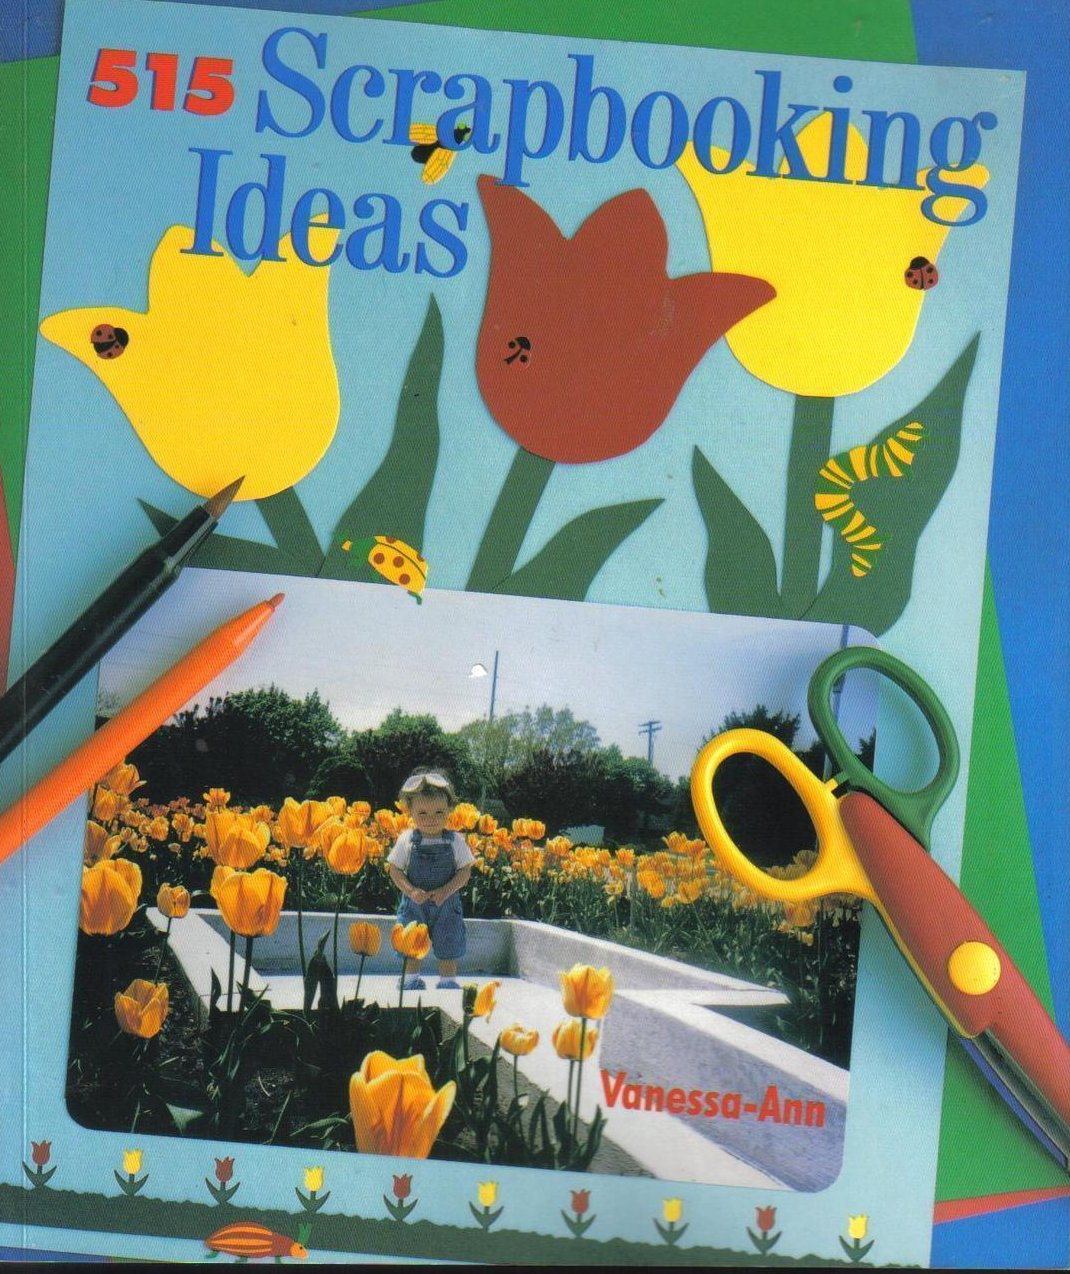 515 Scrapbooking Ideas  Vanessa-Ann Book